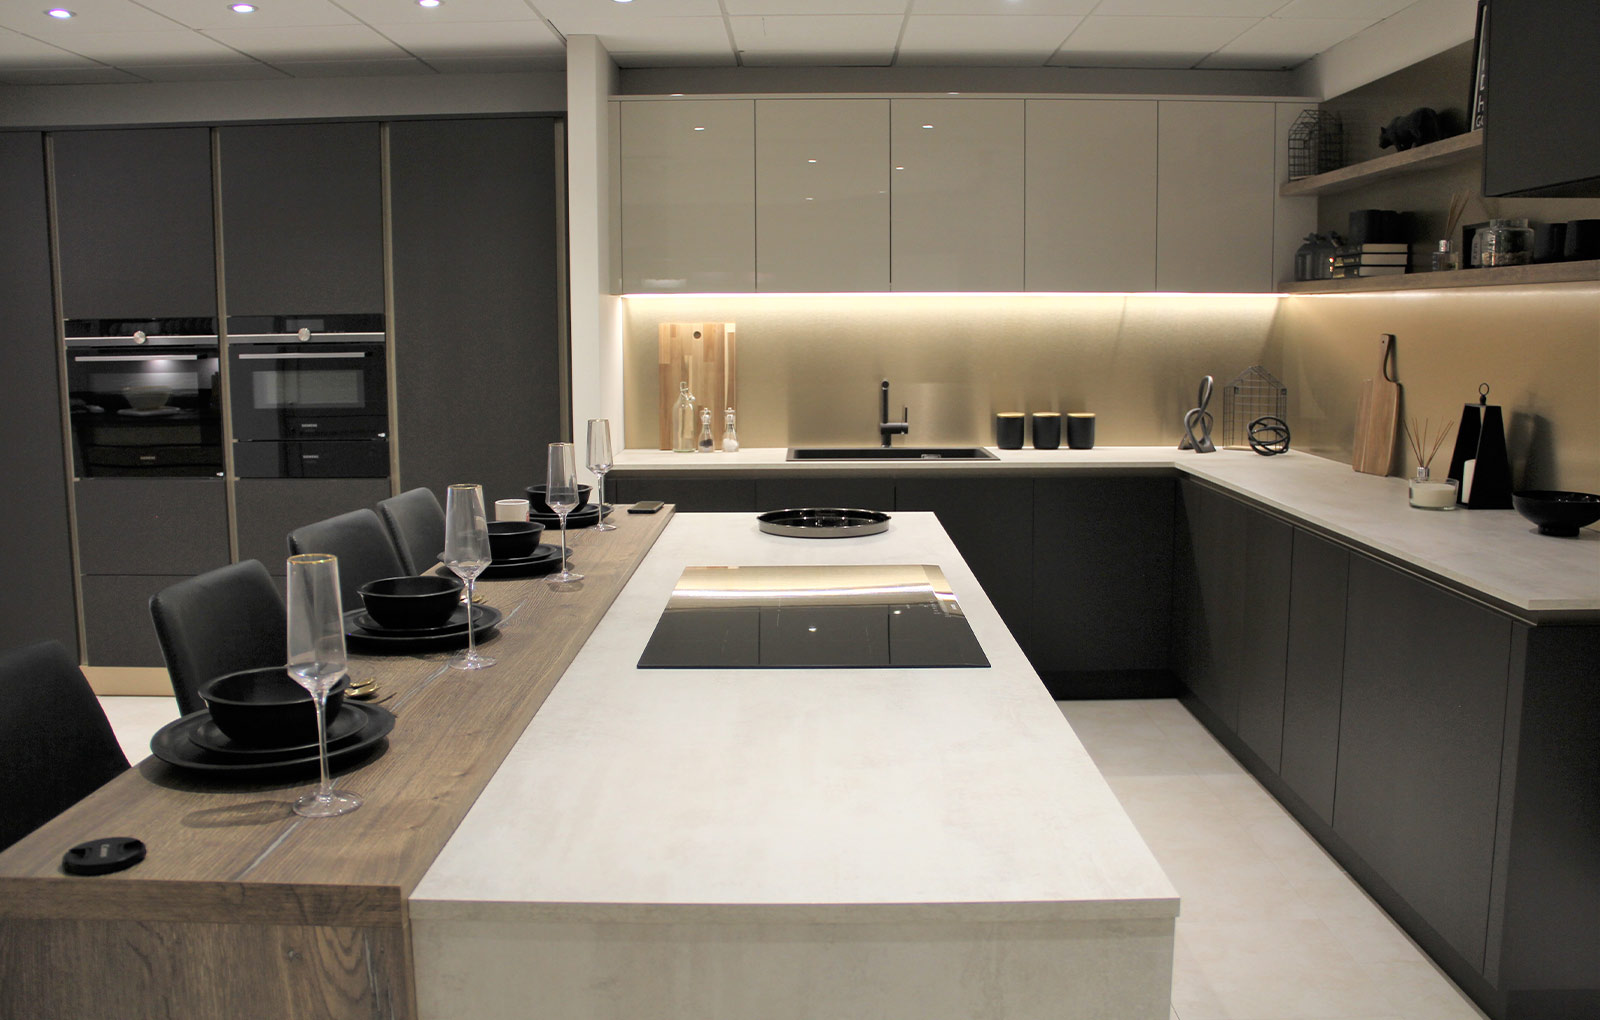 Creating A Modern Luxury Kitchen On A Budget Find Your Kitchen Inspiration Blog Sigma 3 Kitchens